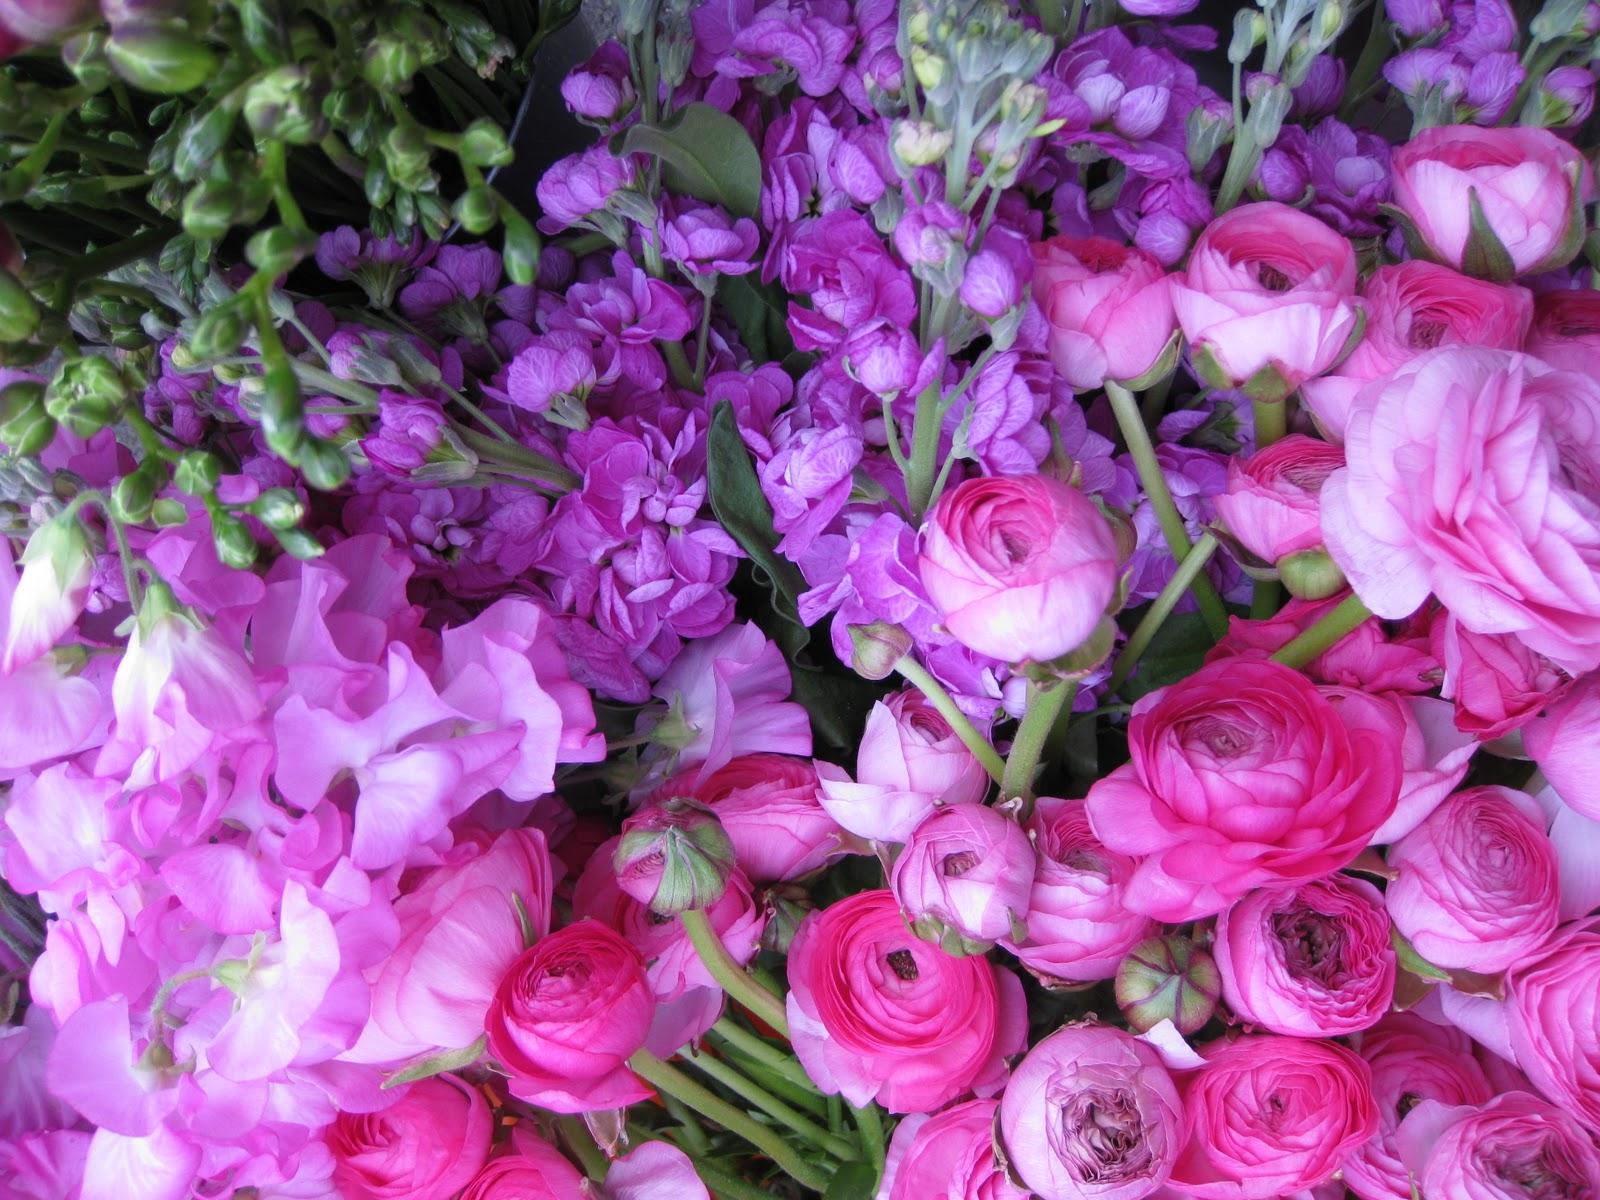 Pink Flowers For Wedding 6 High Resolution Wallpaper